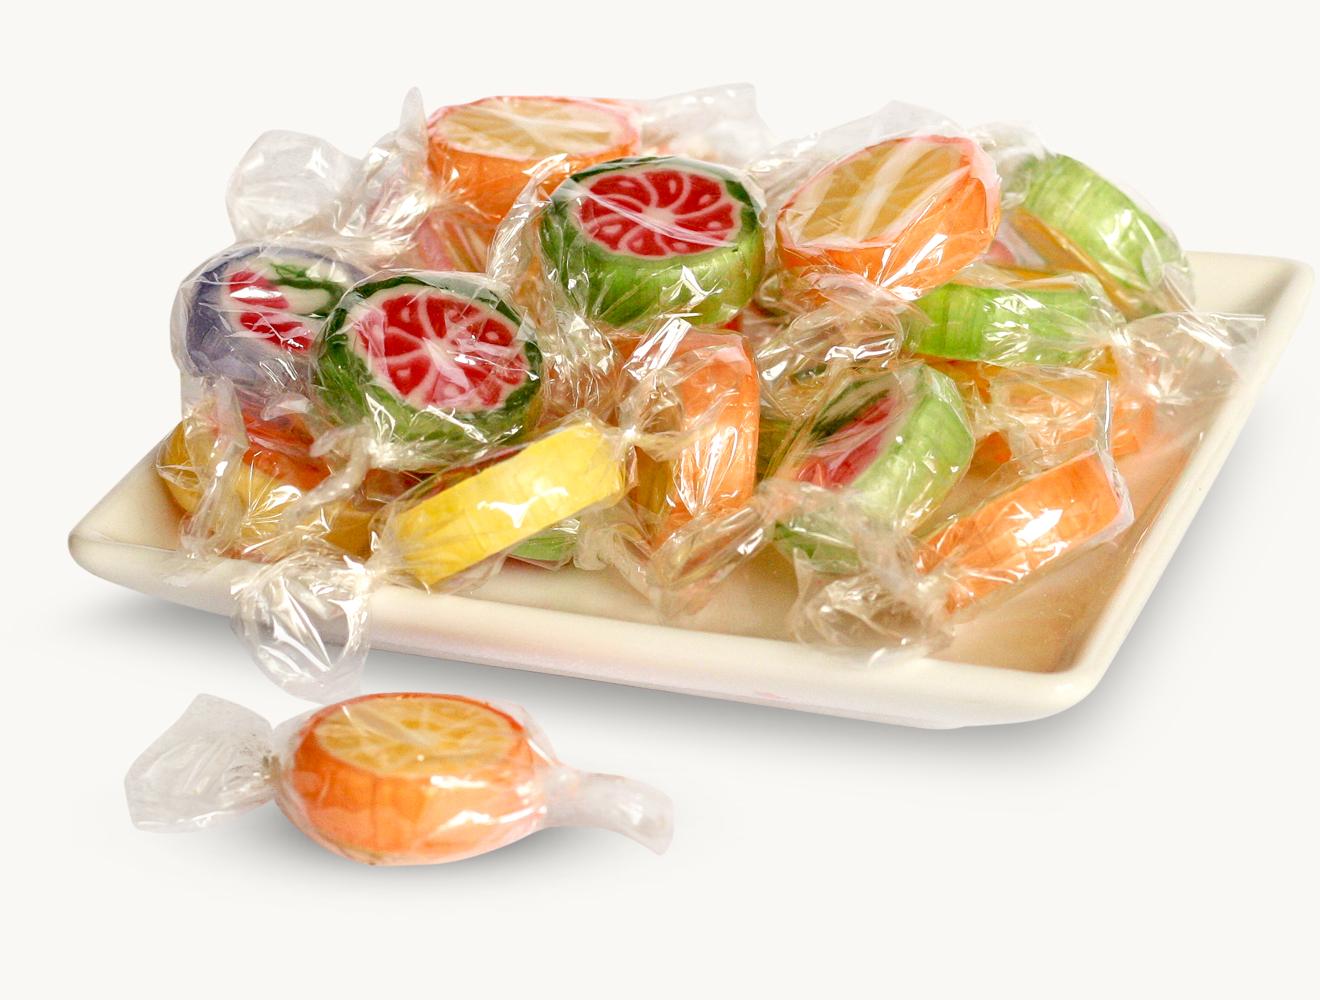 Bonbons Nostalgie Früchte